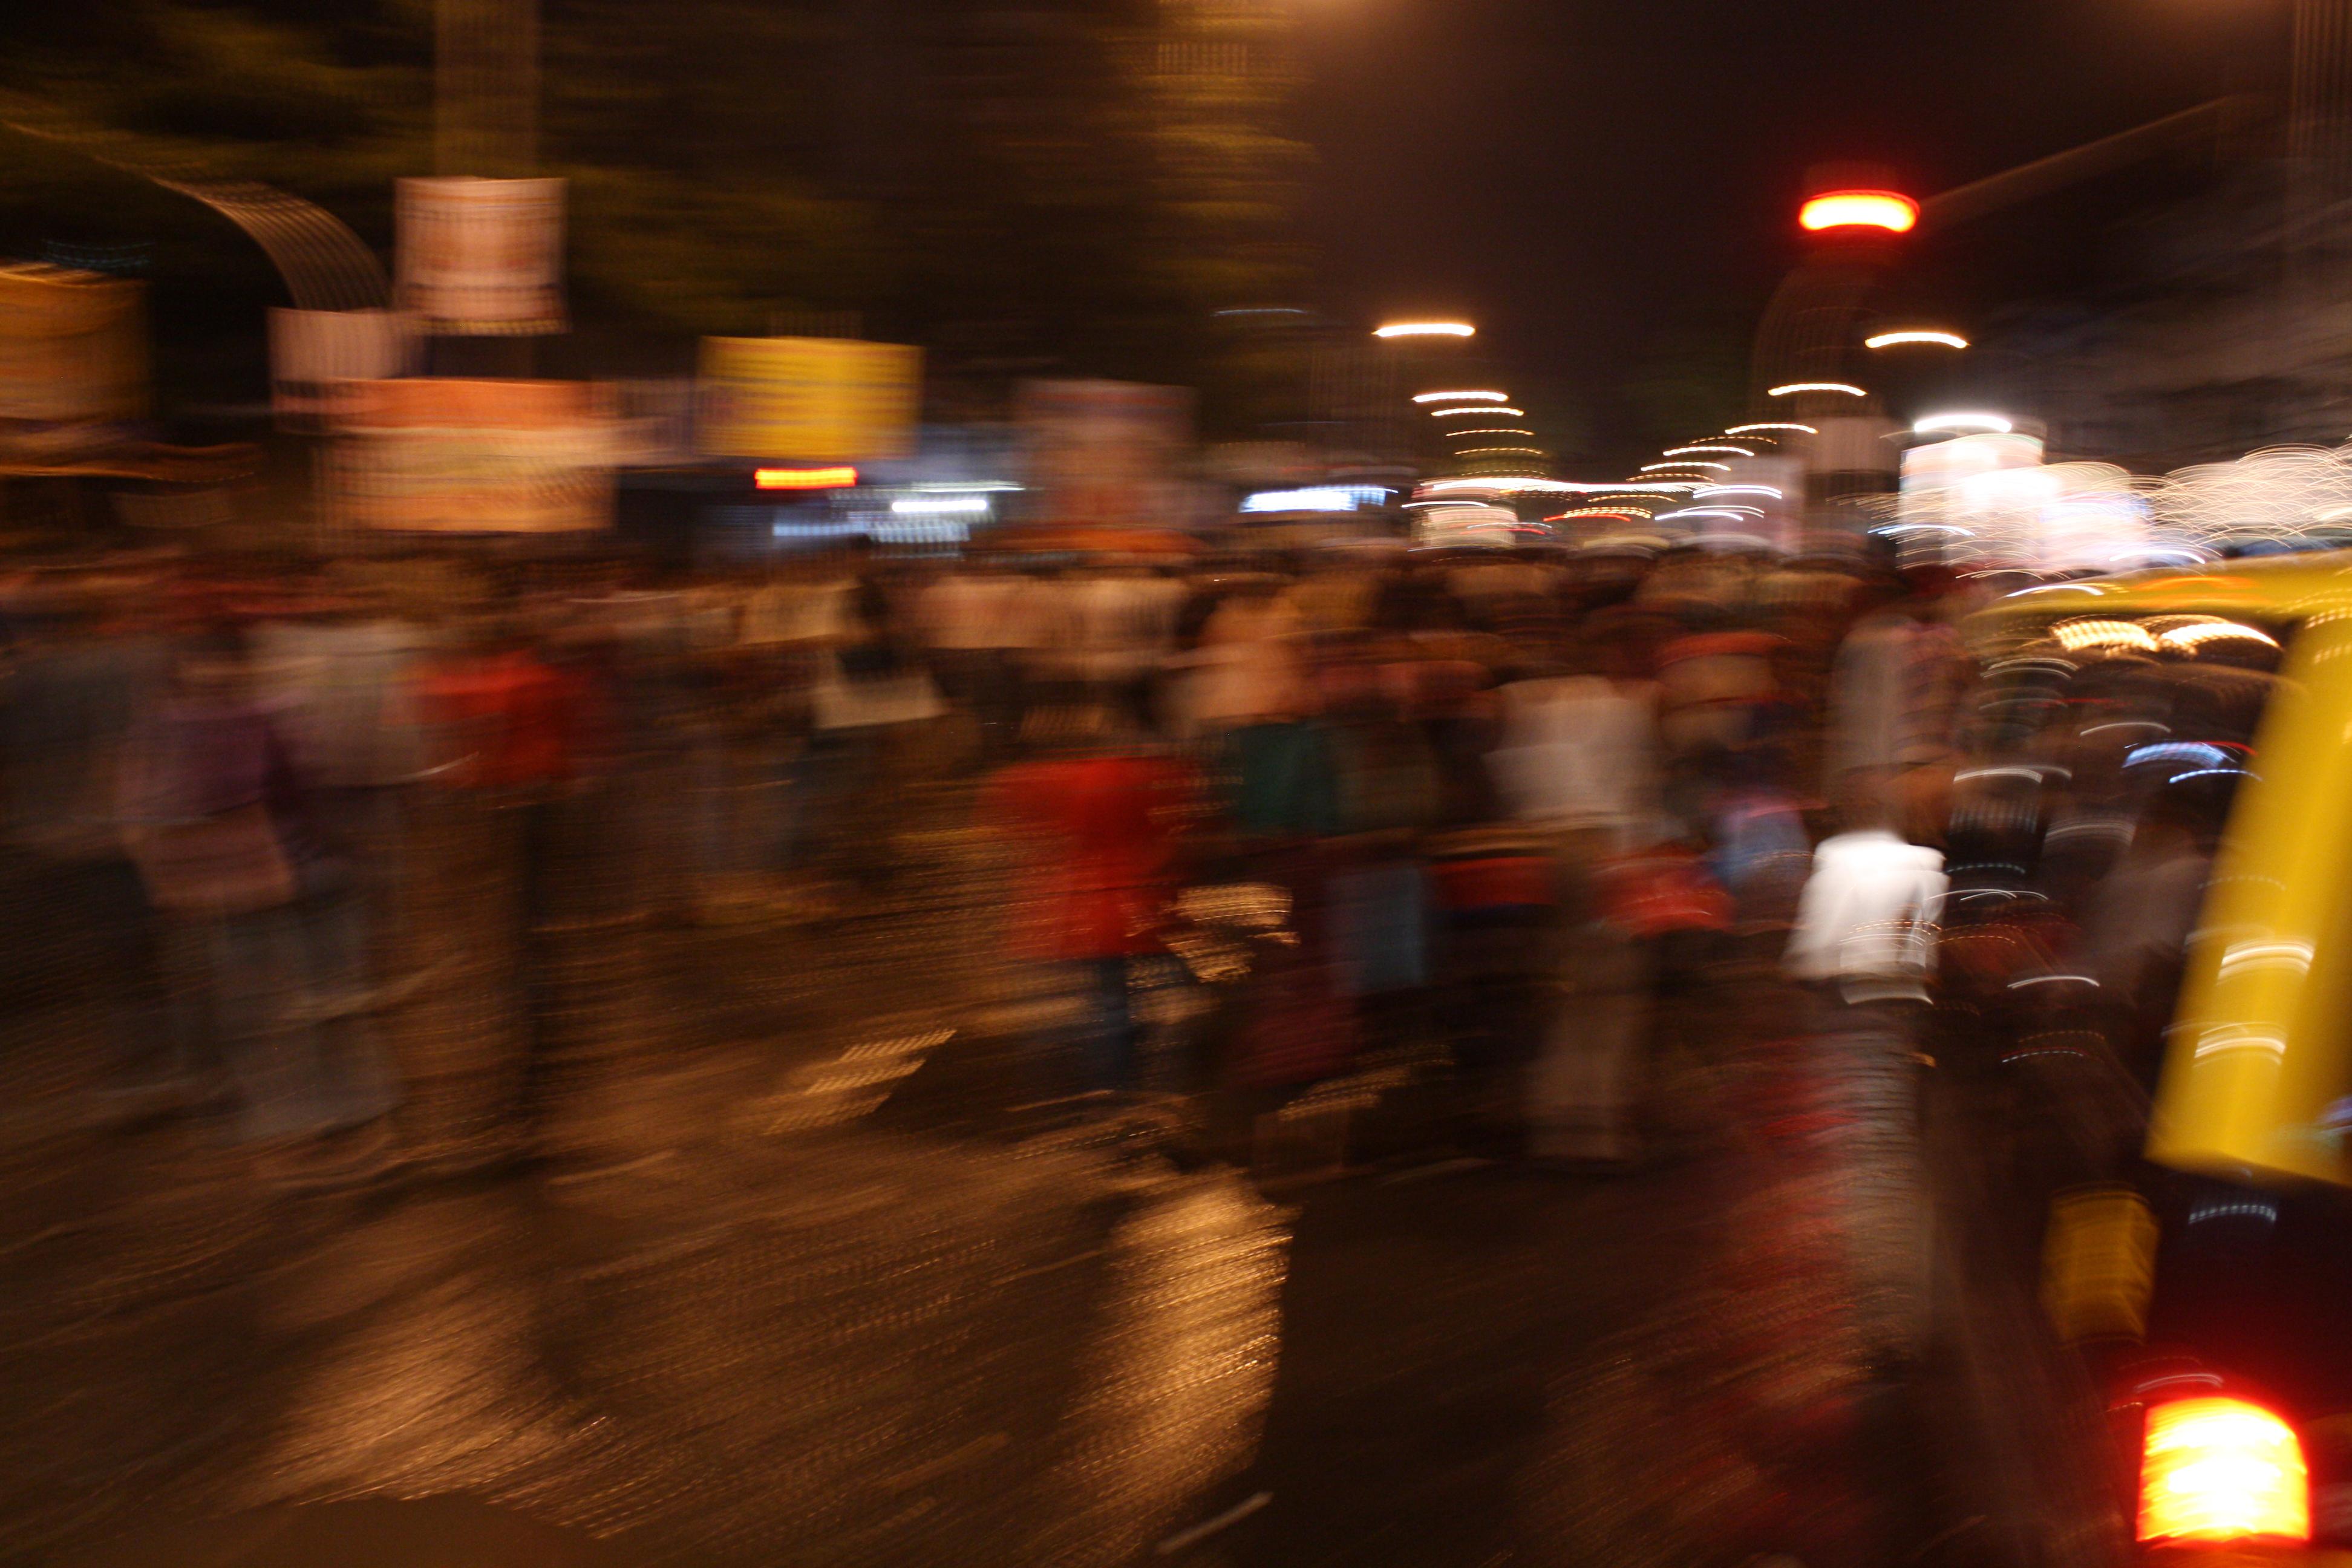 Mumbai streets1(20x30in)